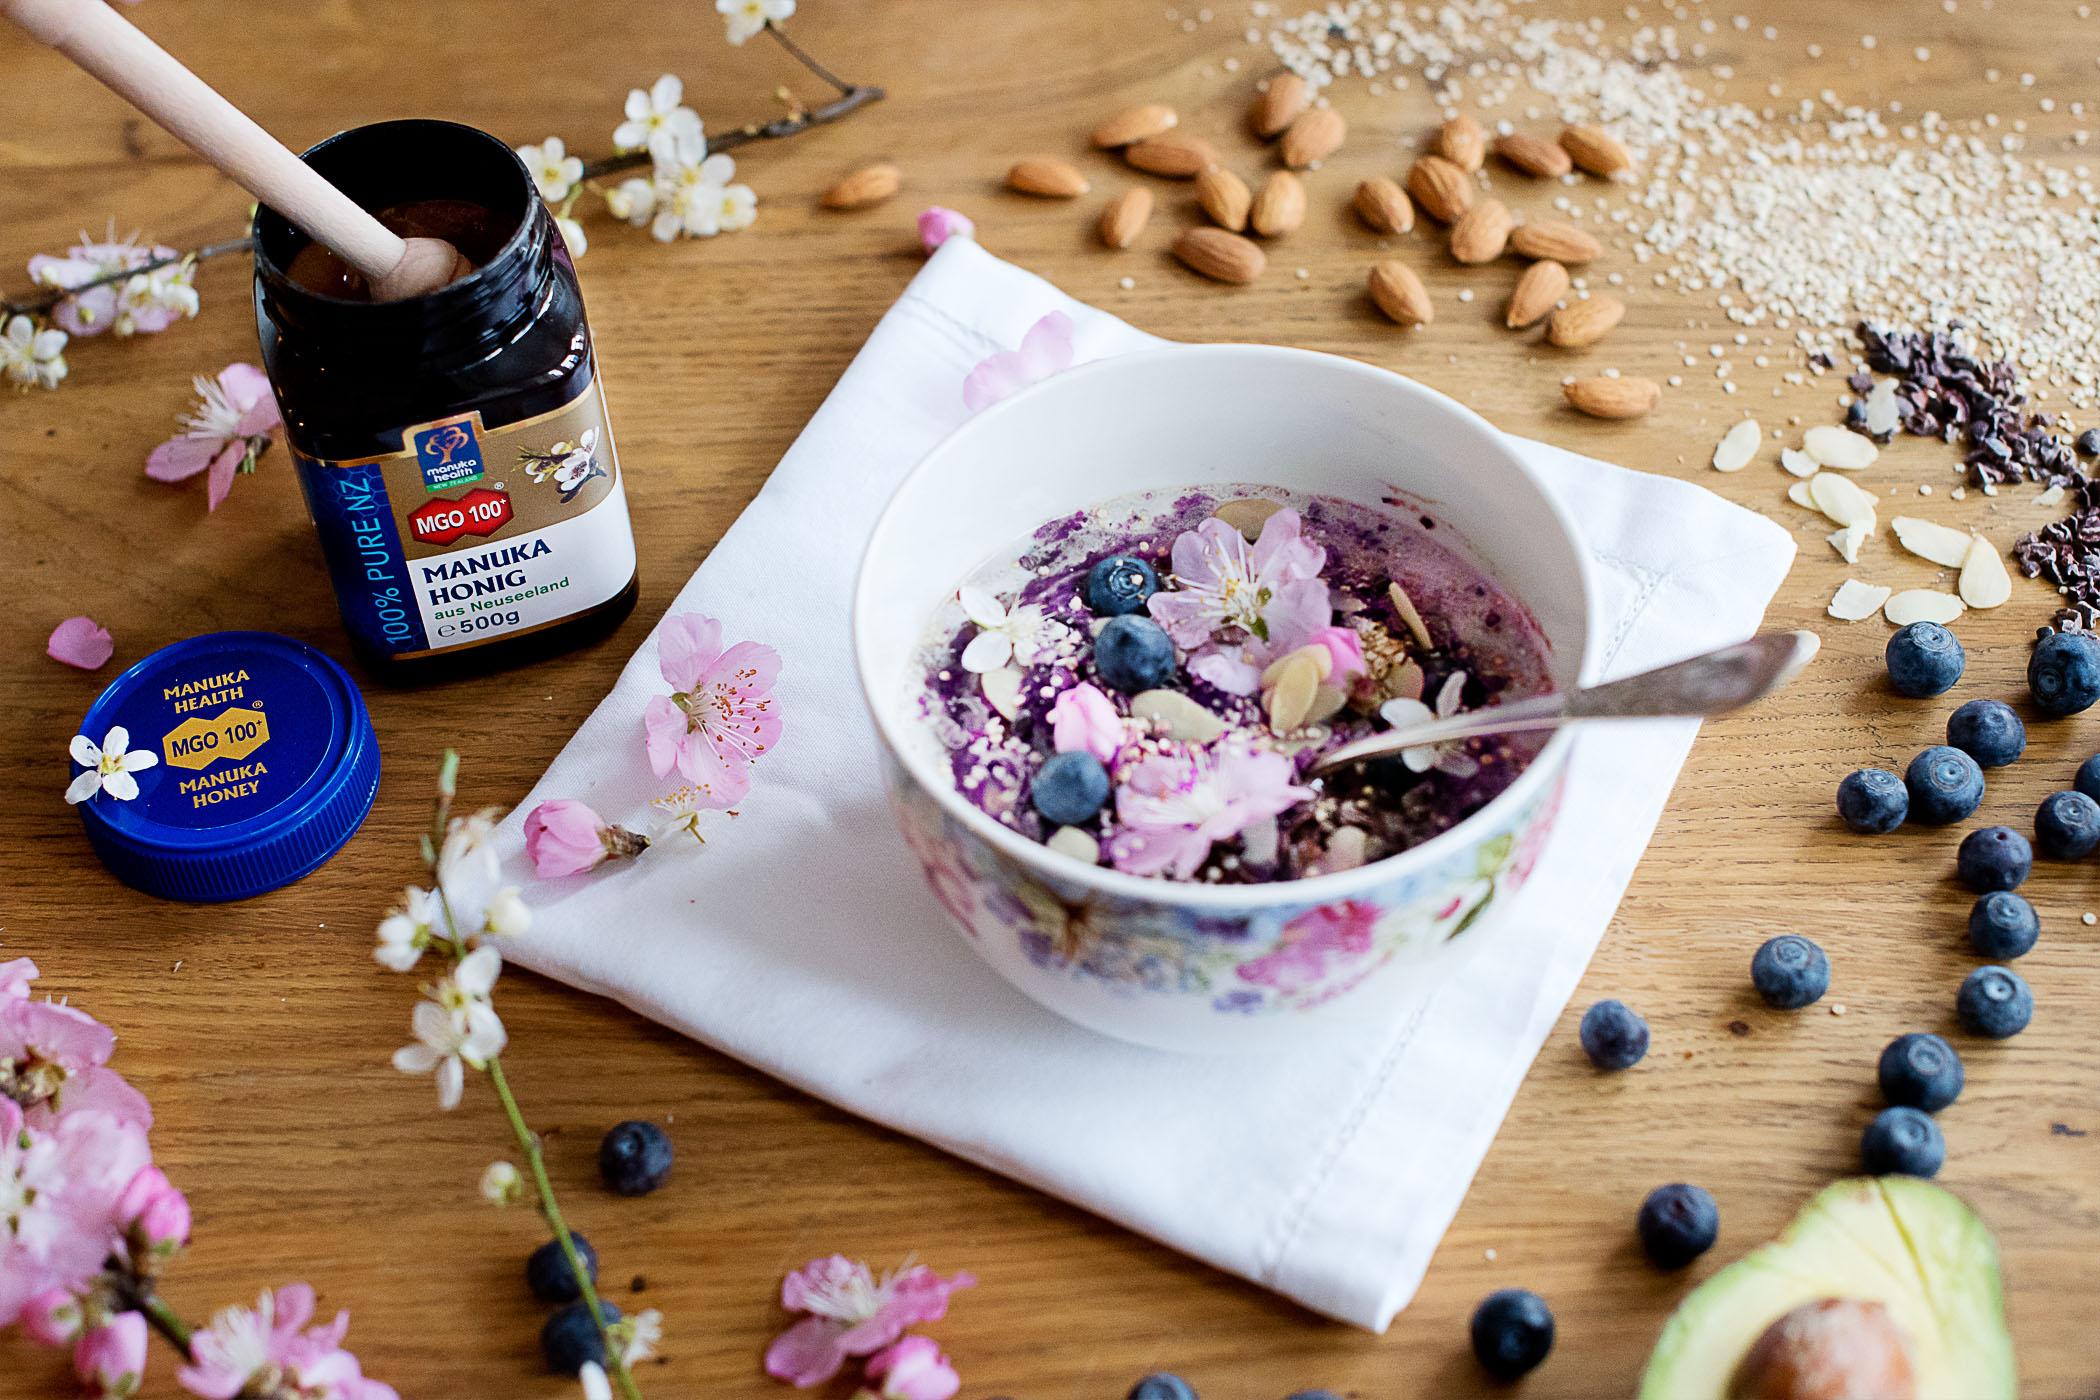 heidelbeer-avocado-manuka-health-smoothie-bowl-rezept